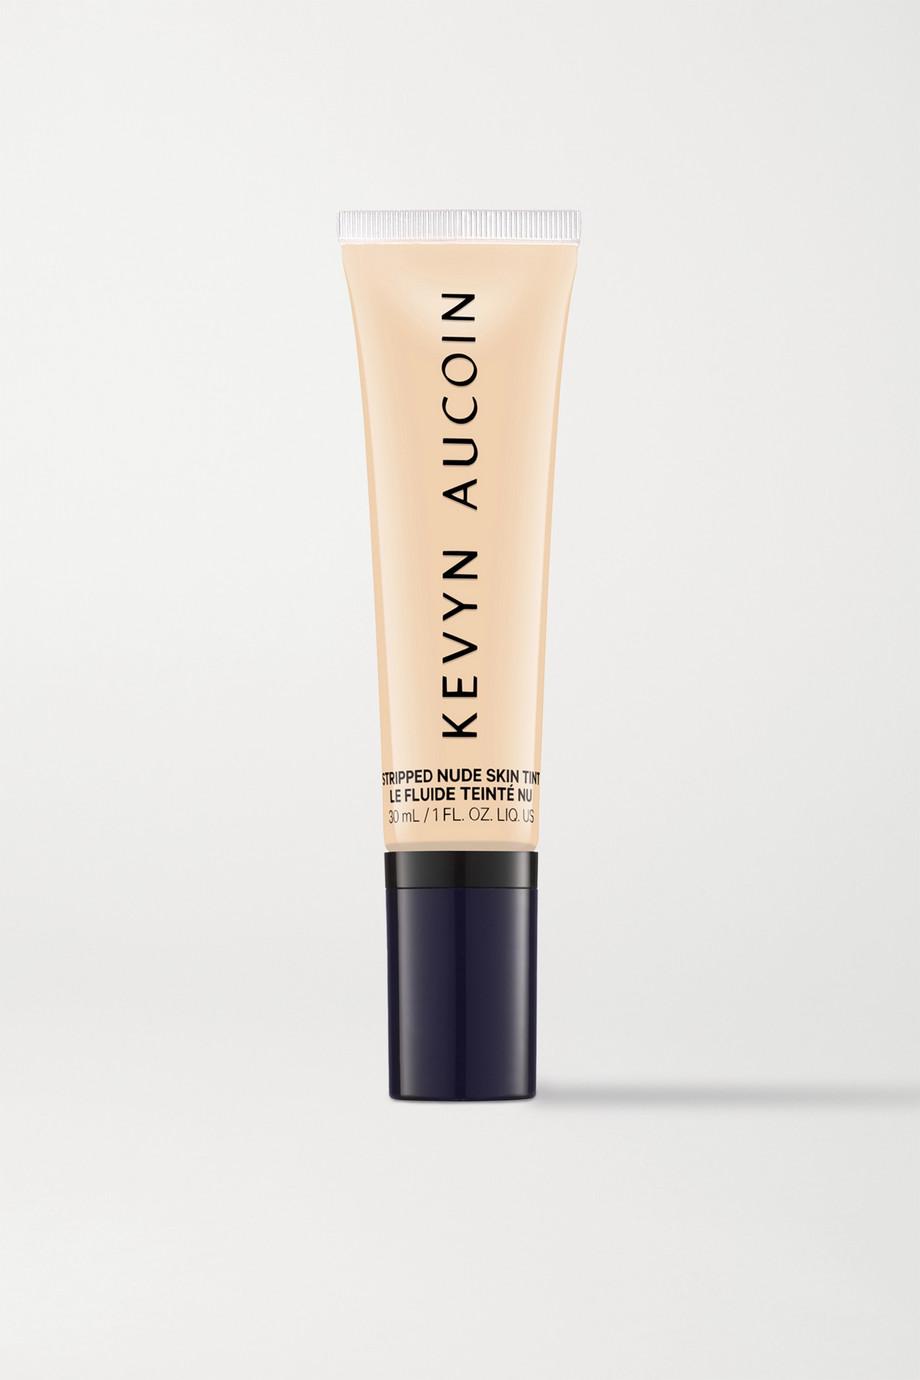 Kevyn Aucoin Stripped Nude Skin Tint - Light 01, 30ml